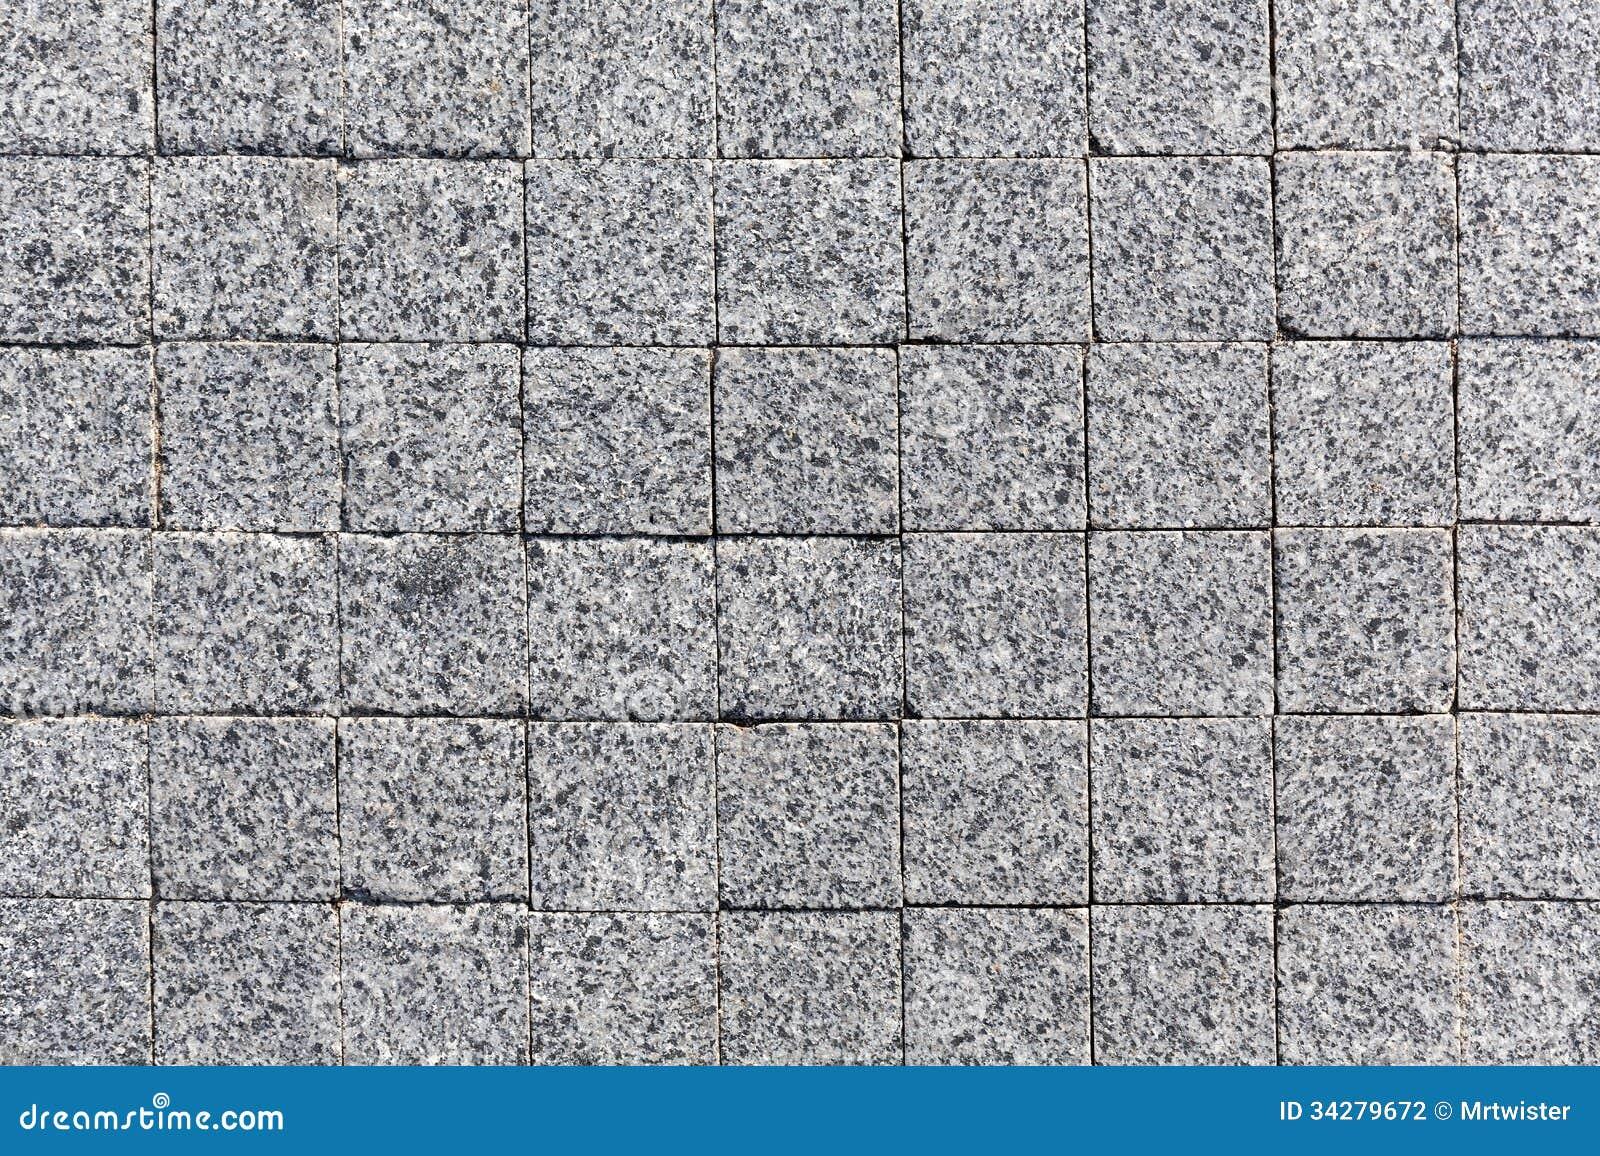 Stone Block Paving Texture Stock Photo Image Of Granite 34279672